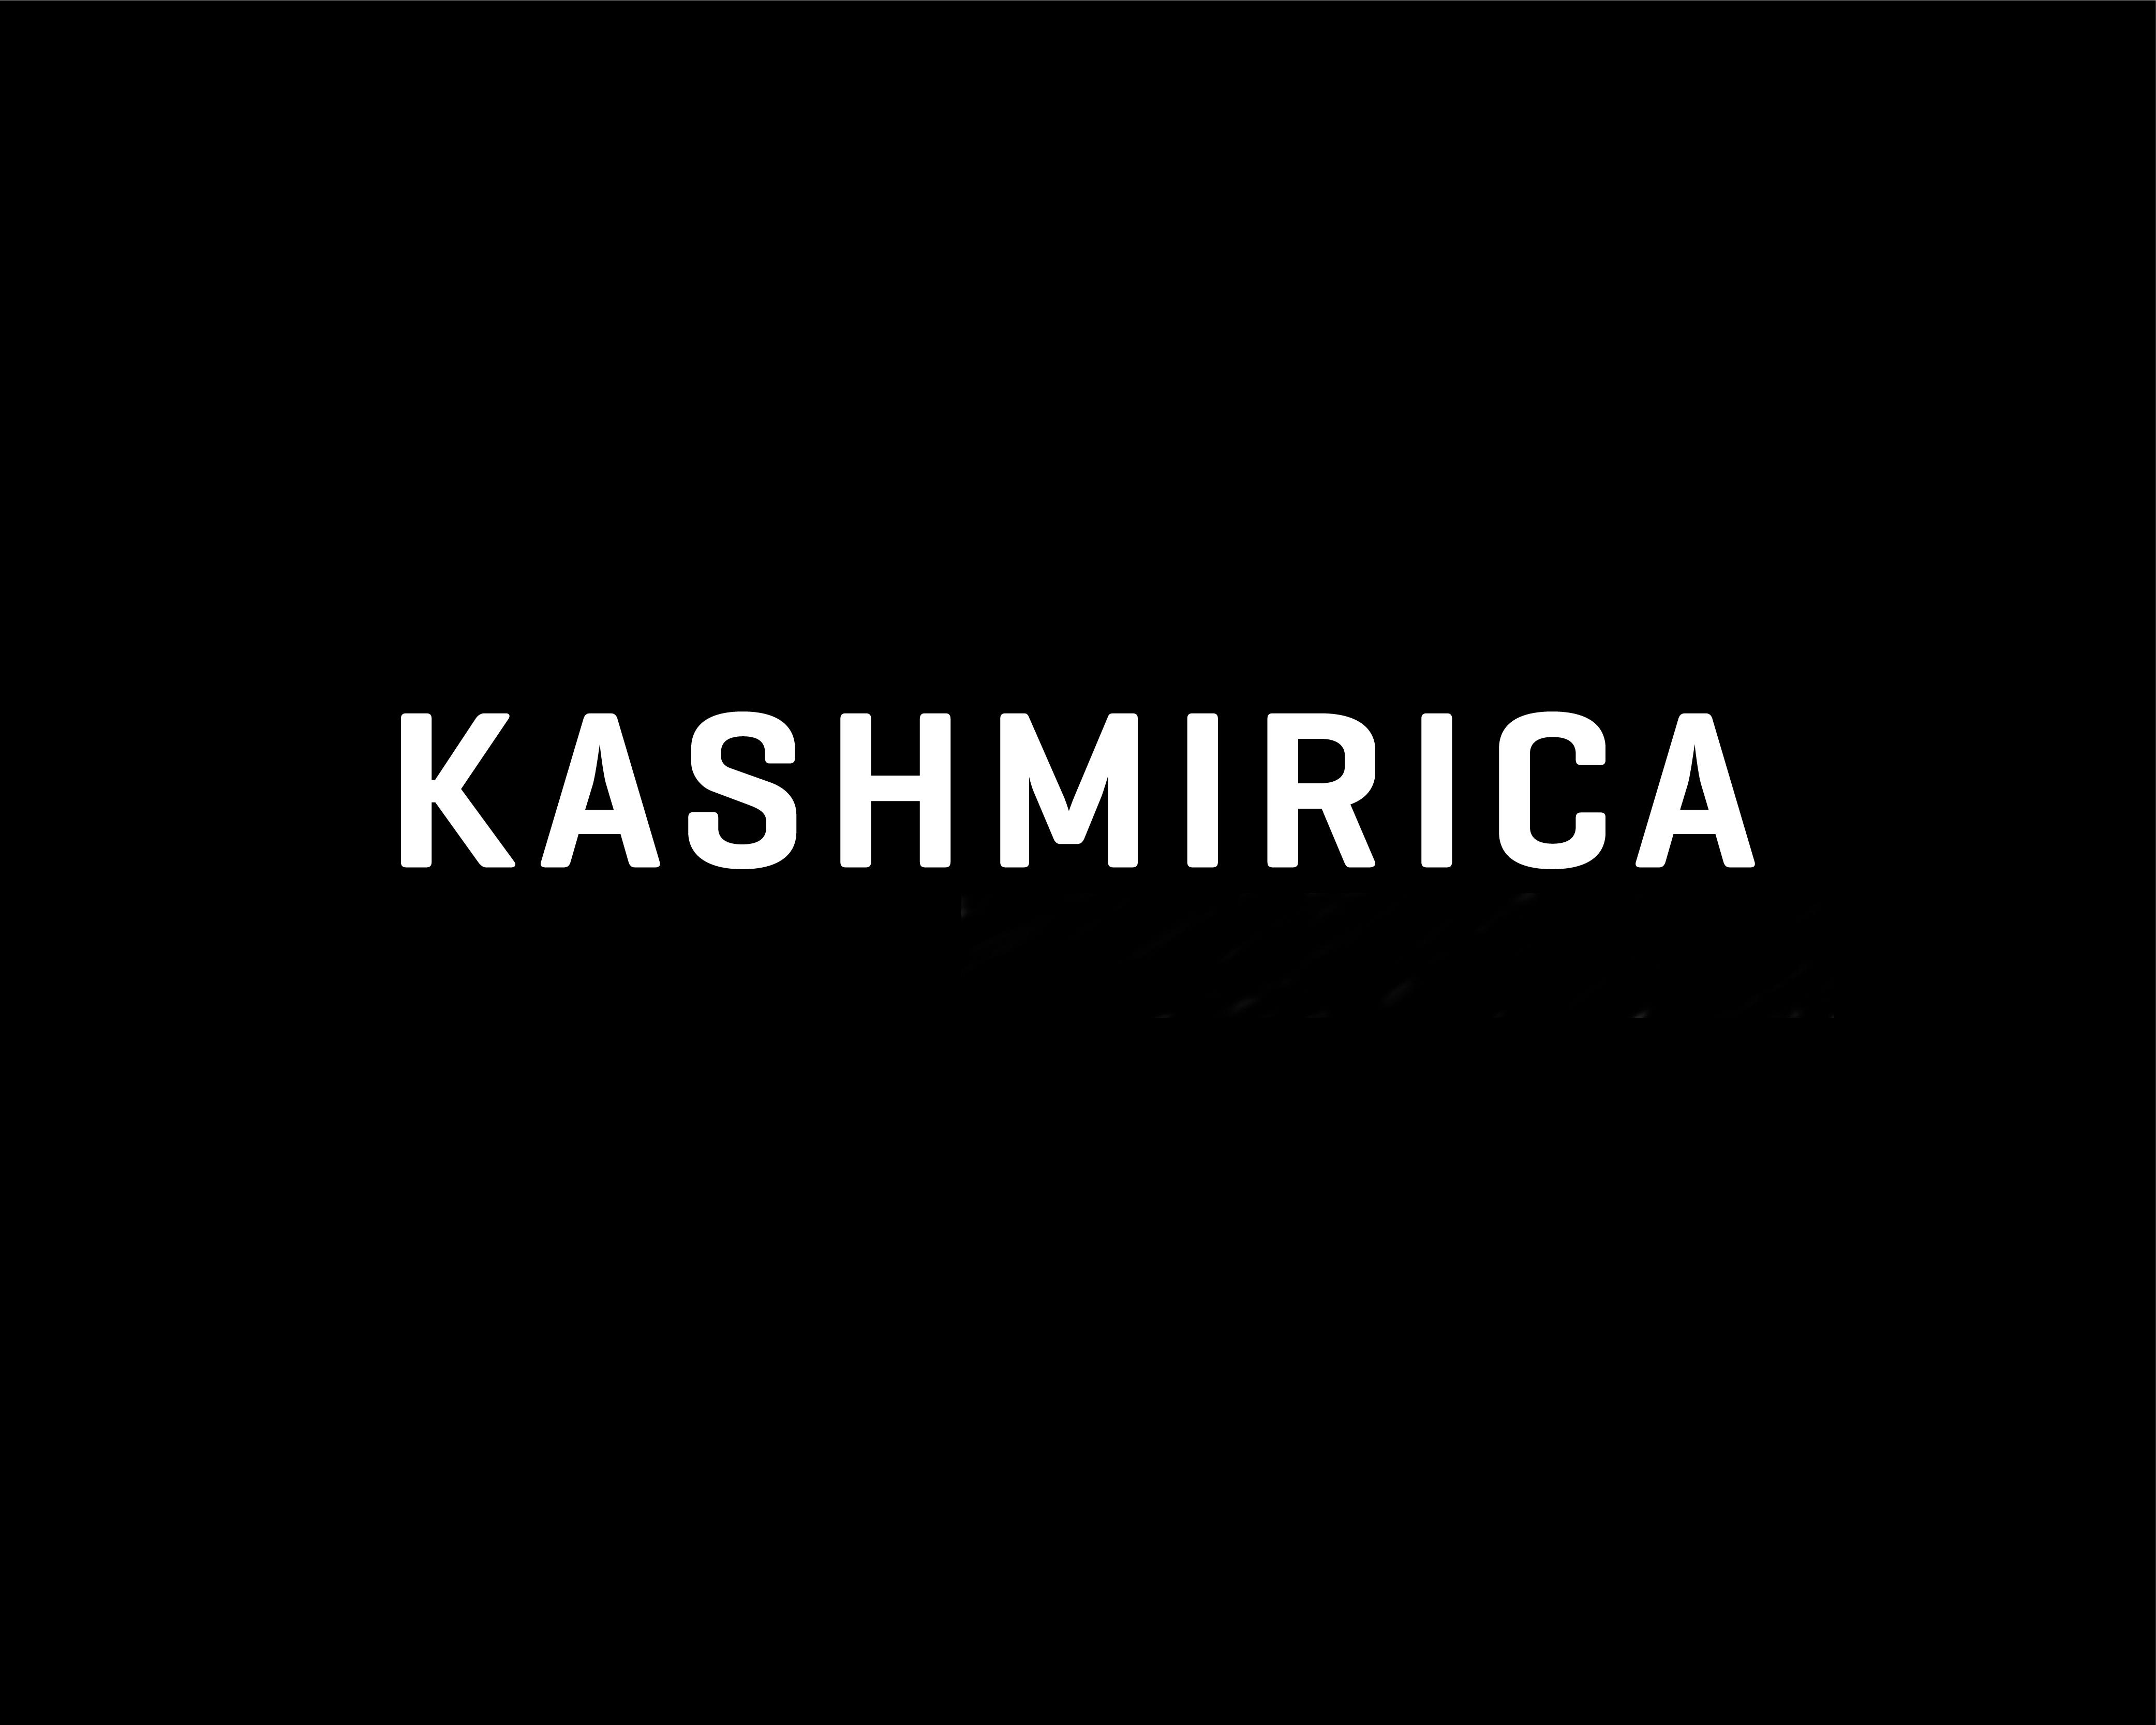 Kashmirica Logo Black